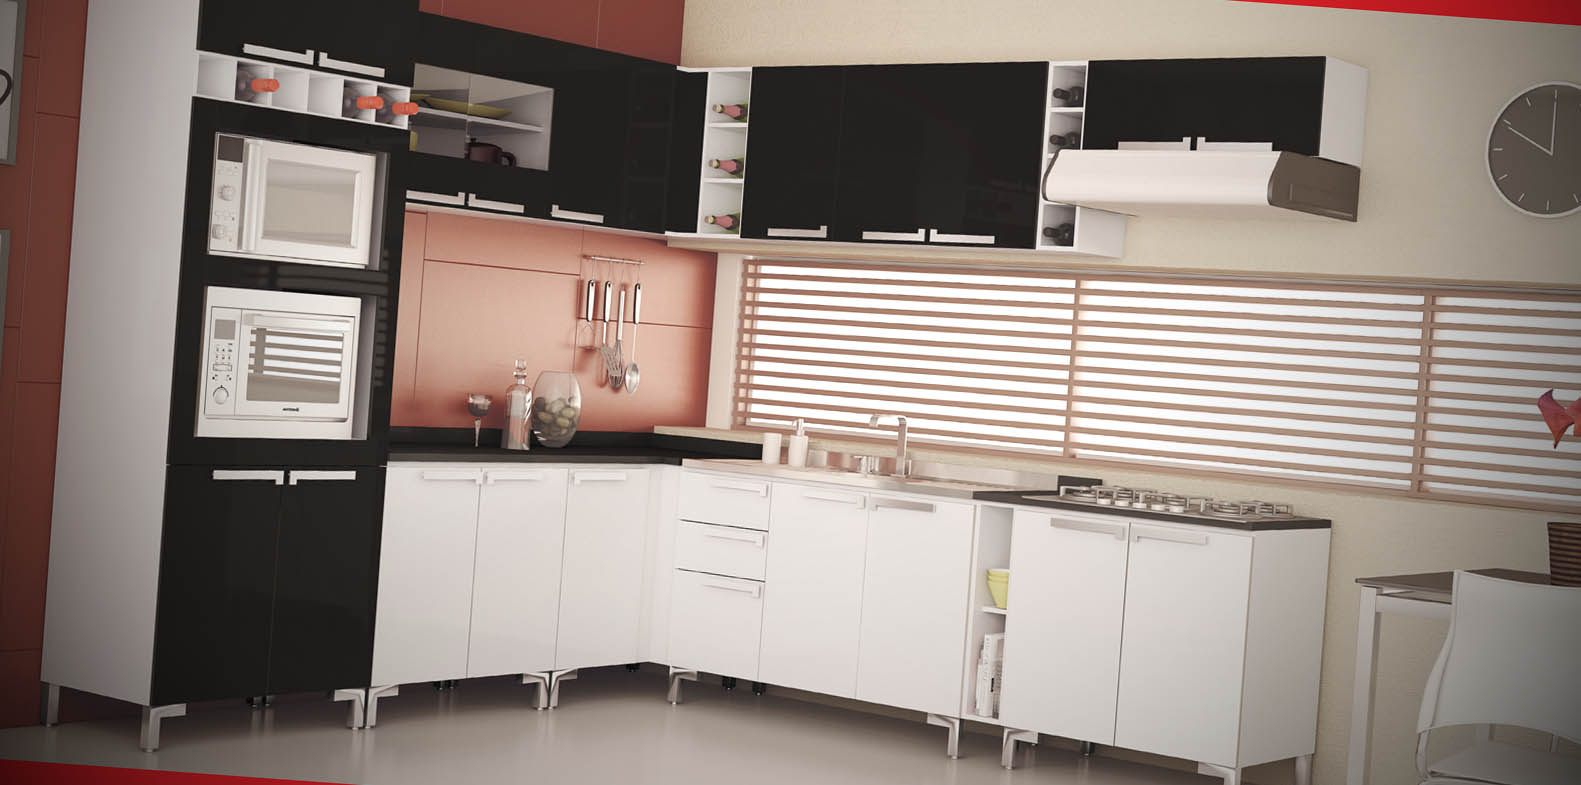 kappesberg-cozinha